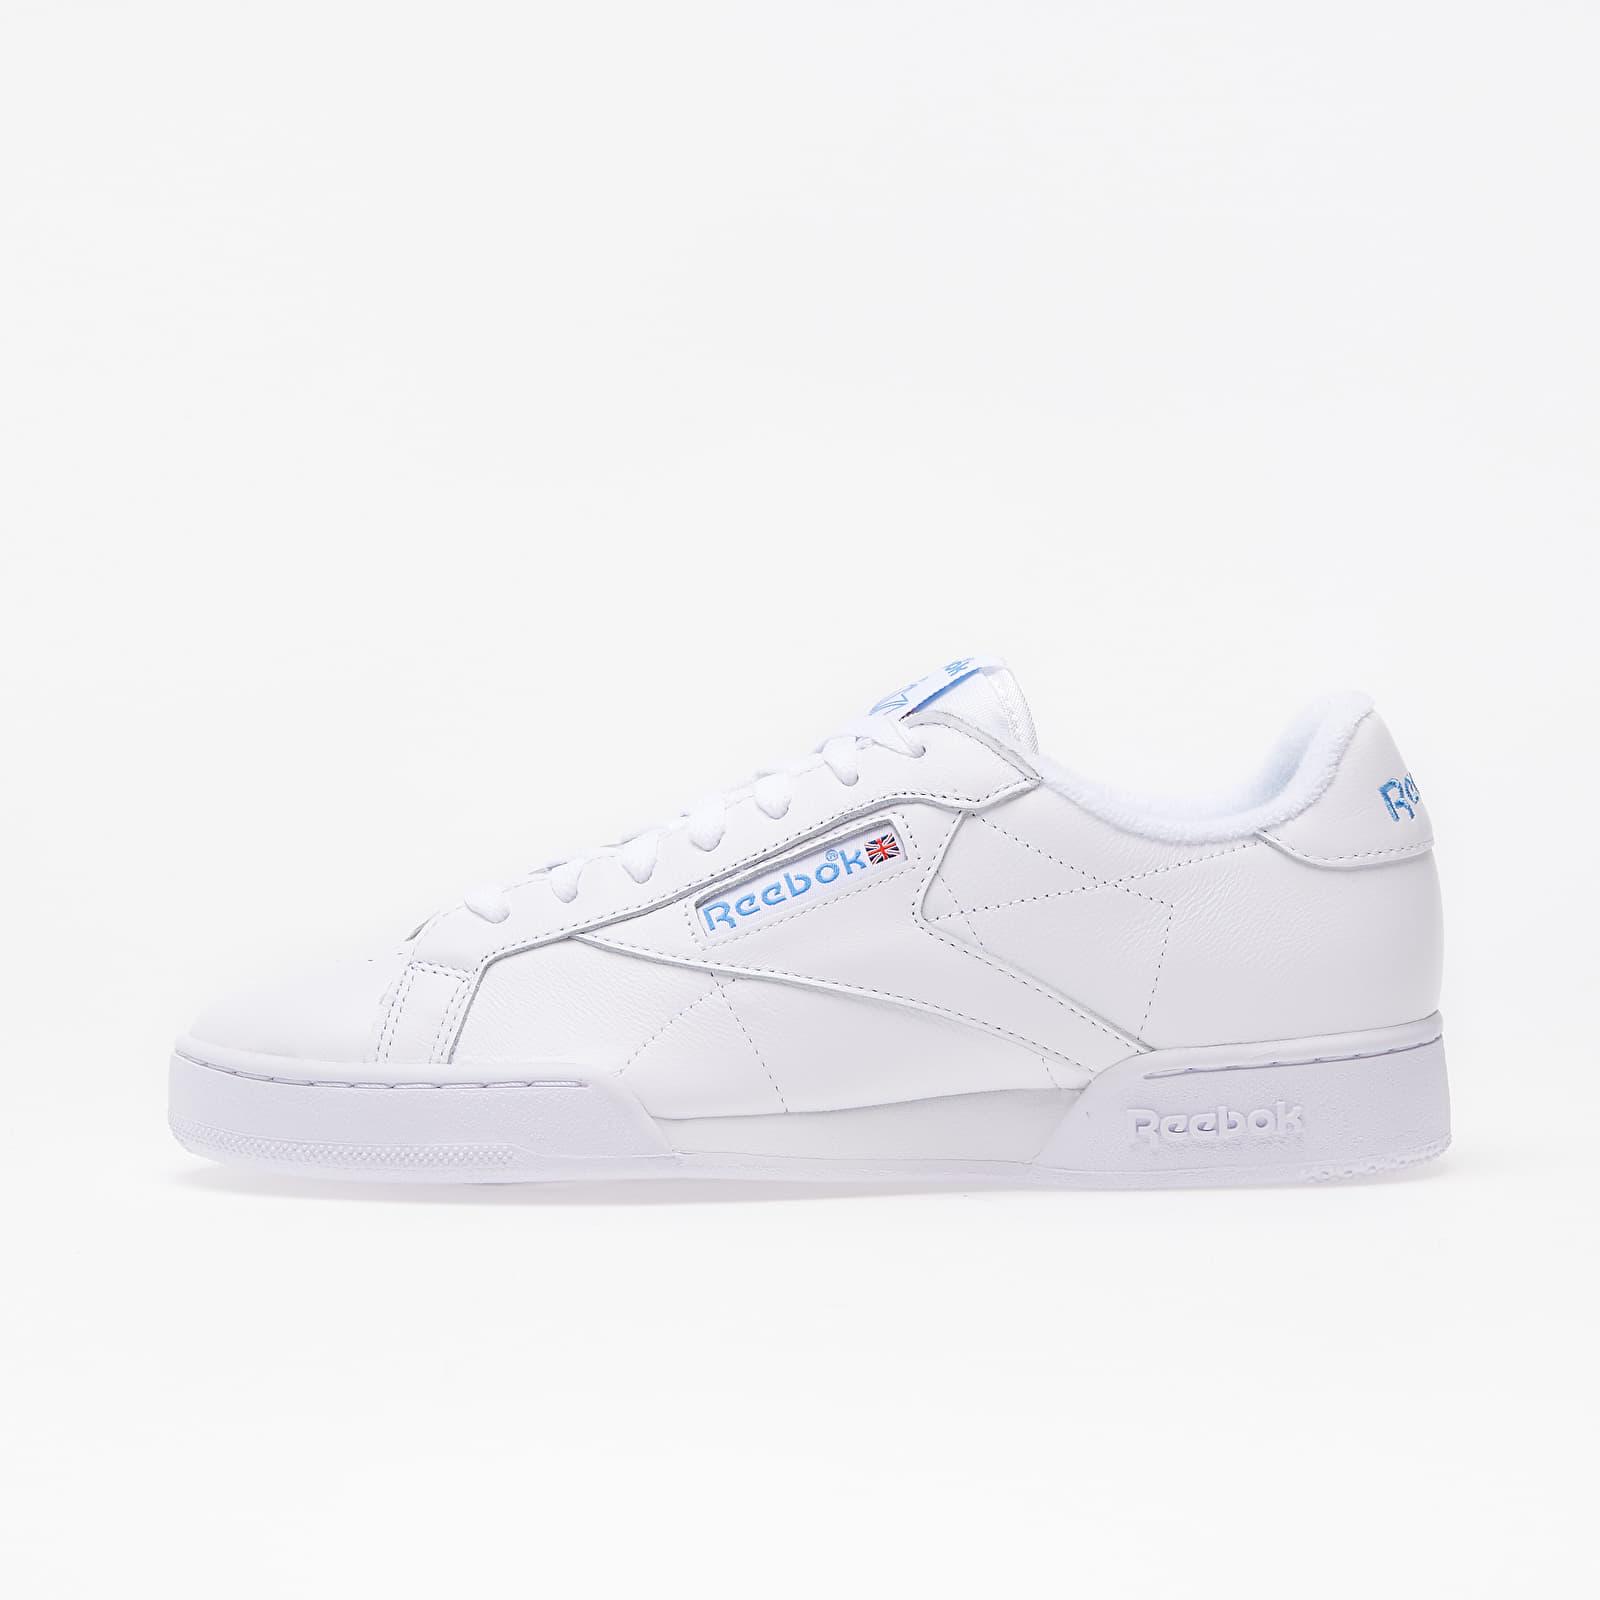 Reebok NPC UK II White/ Athletic Blue/ White EUR 45